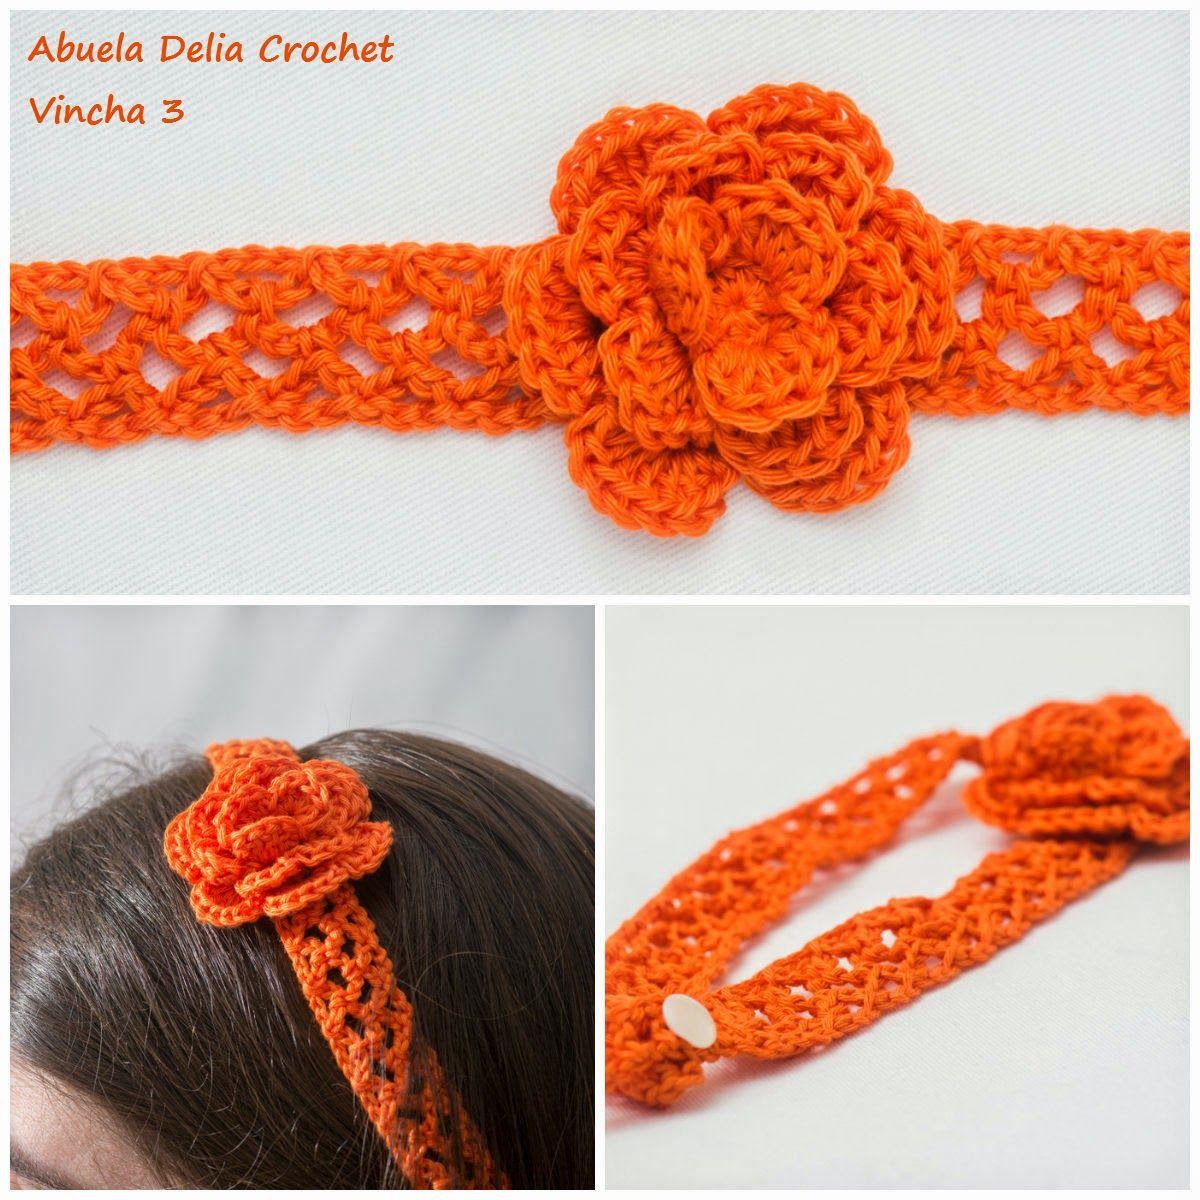 Vinchas para el cabello en Crochet | crochet | Pinterest | Häkelmützen